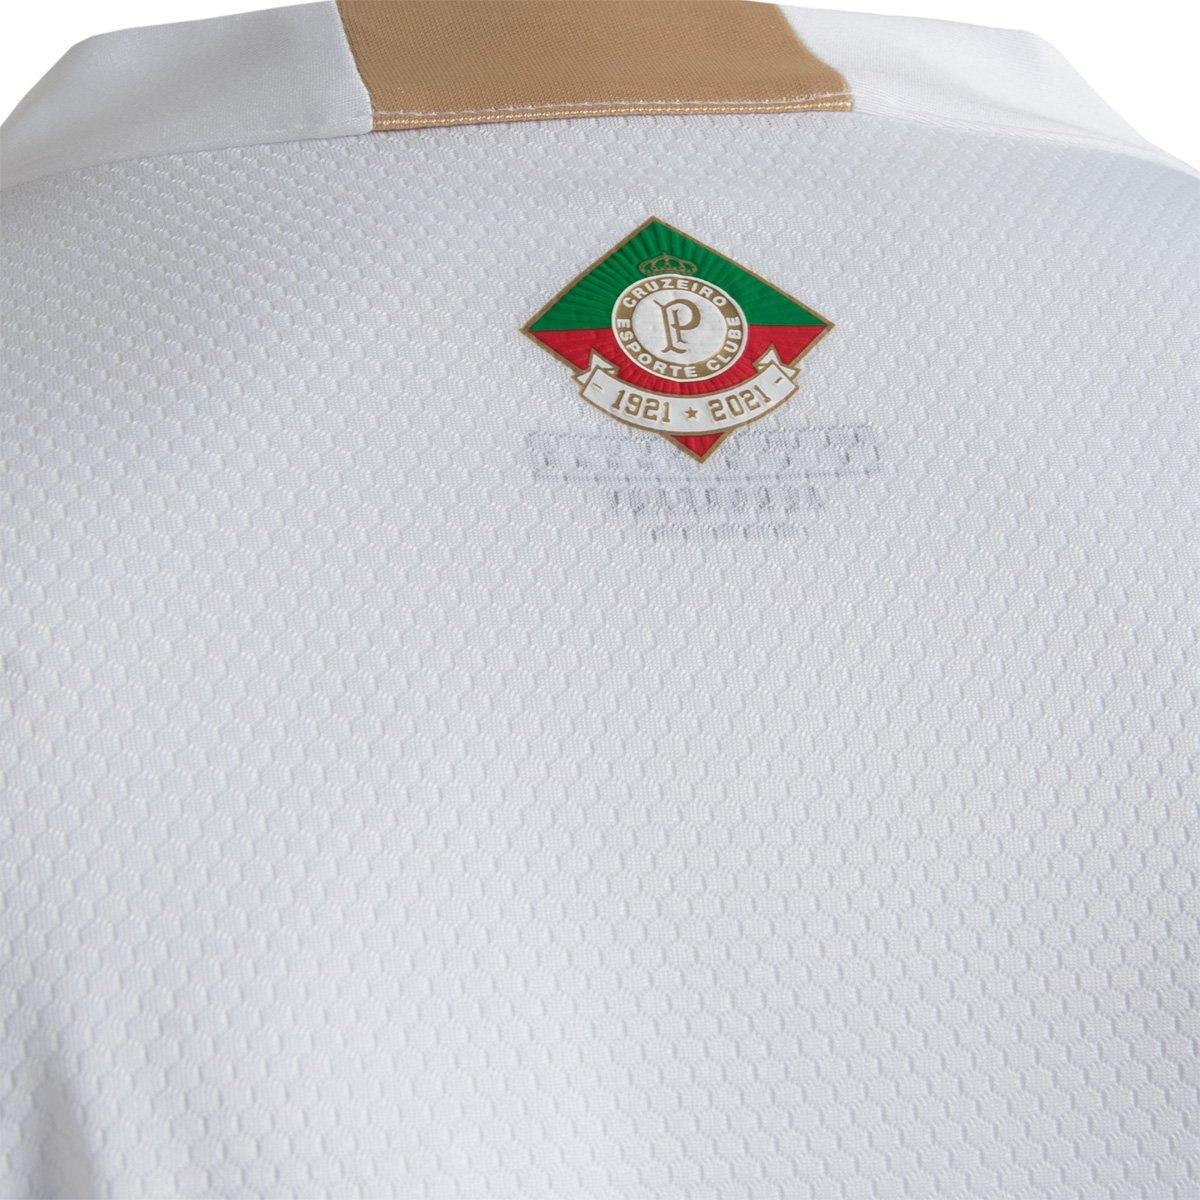 Camisa Cruzeiro II 21/22 s/n° Torcedor Adidas